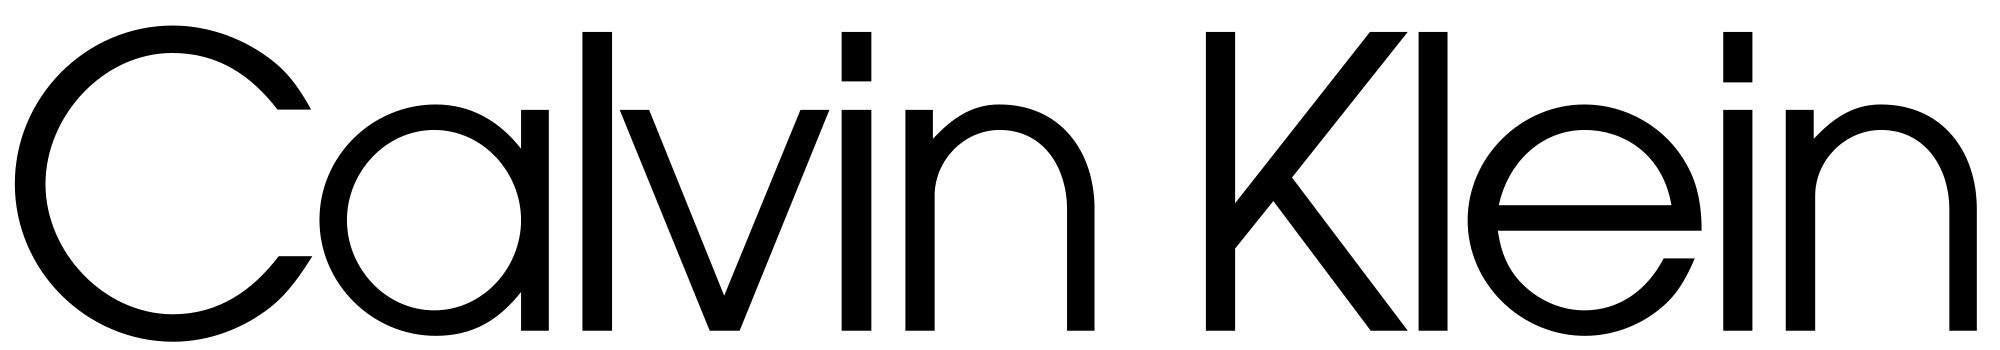 calvin klein sans serif font